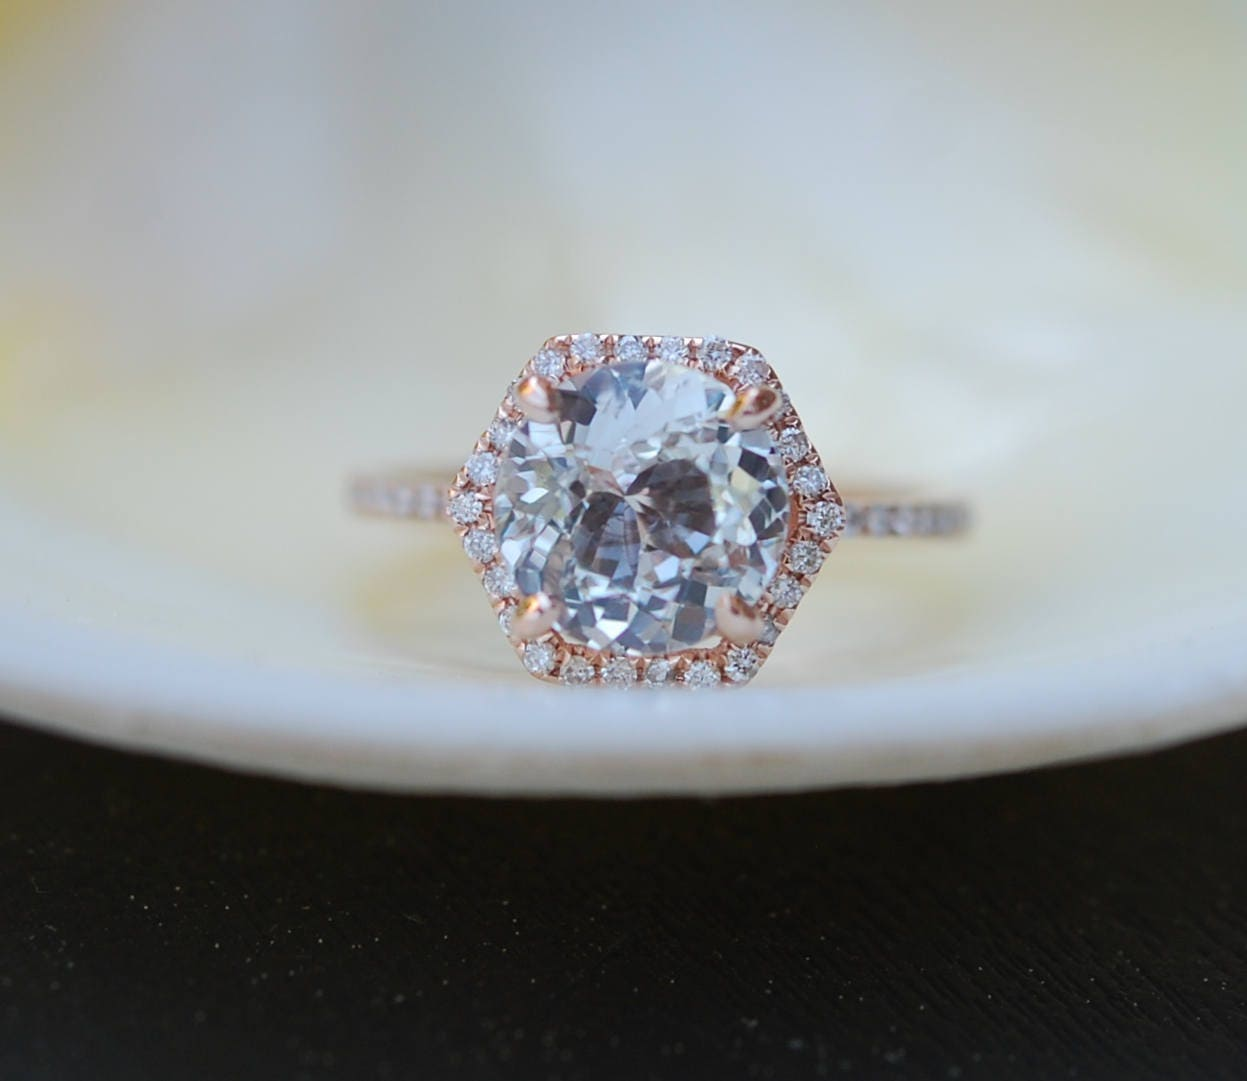 Hexagon Engagement Ring White Sapphire Ring 14k Rose Gold 3ct Round Sapphire  Engagement Ring By Eidelpresious